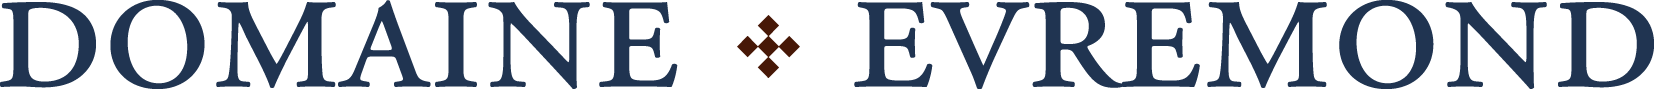 Domaine Evremond